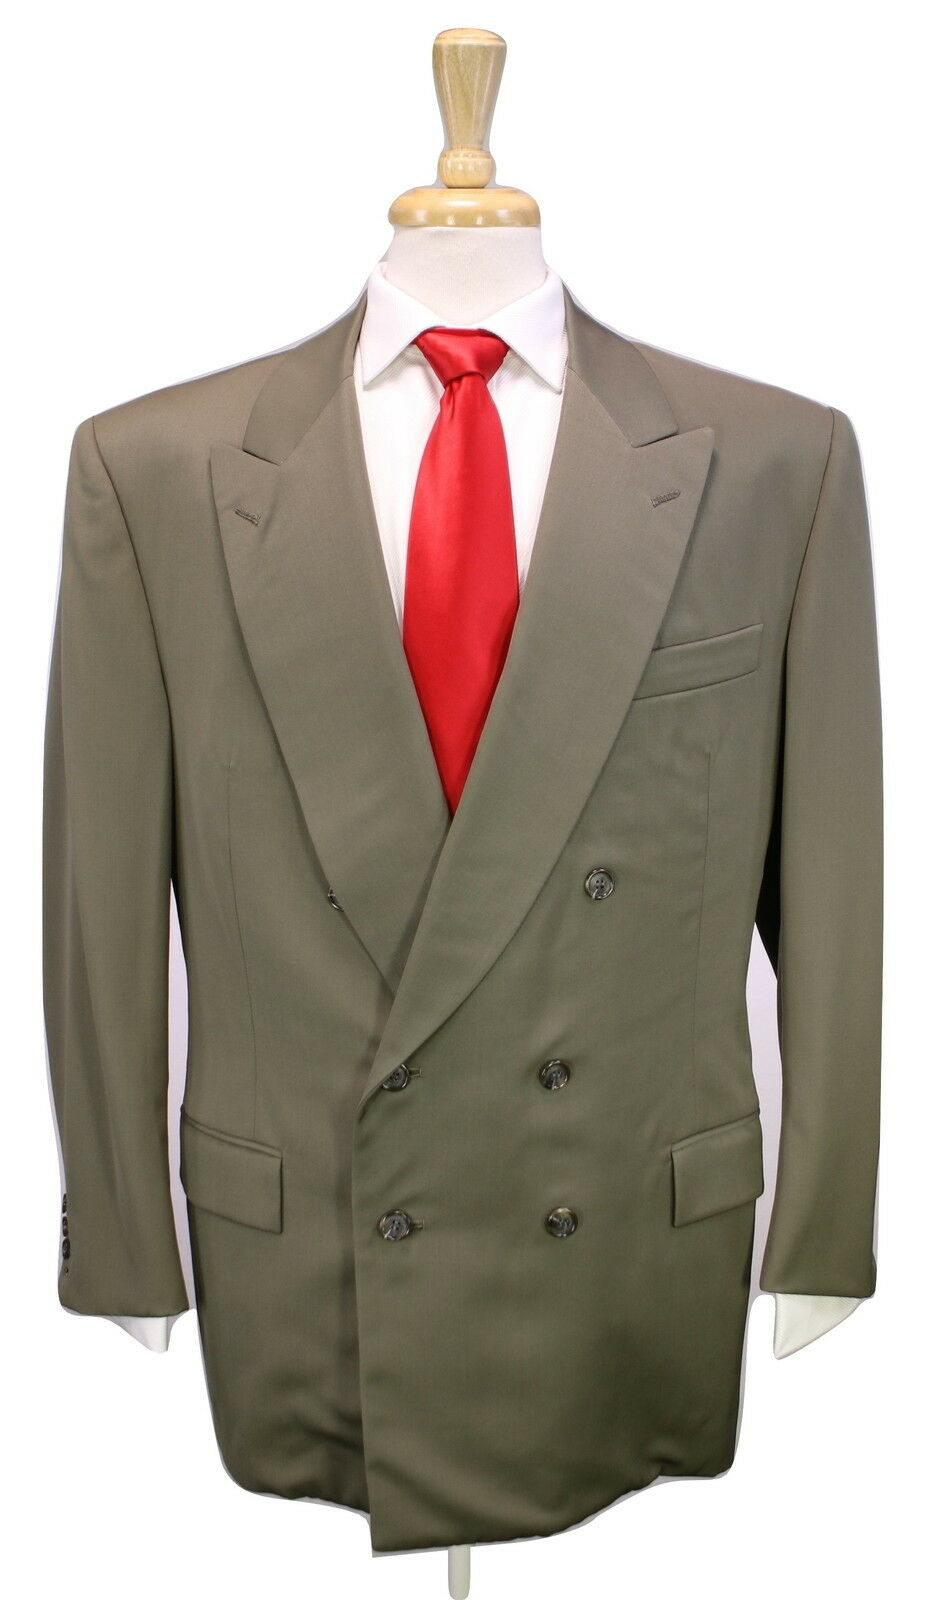 WILLIAM FIORAVANTI  Bespoke Solid Olive Full Canvas 2-Btn DB Wool Suit 40R